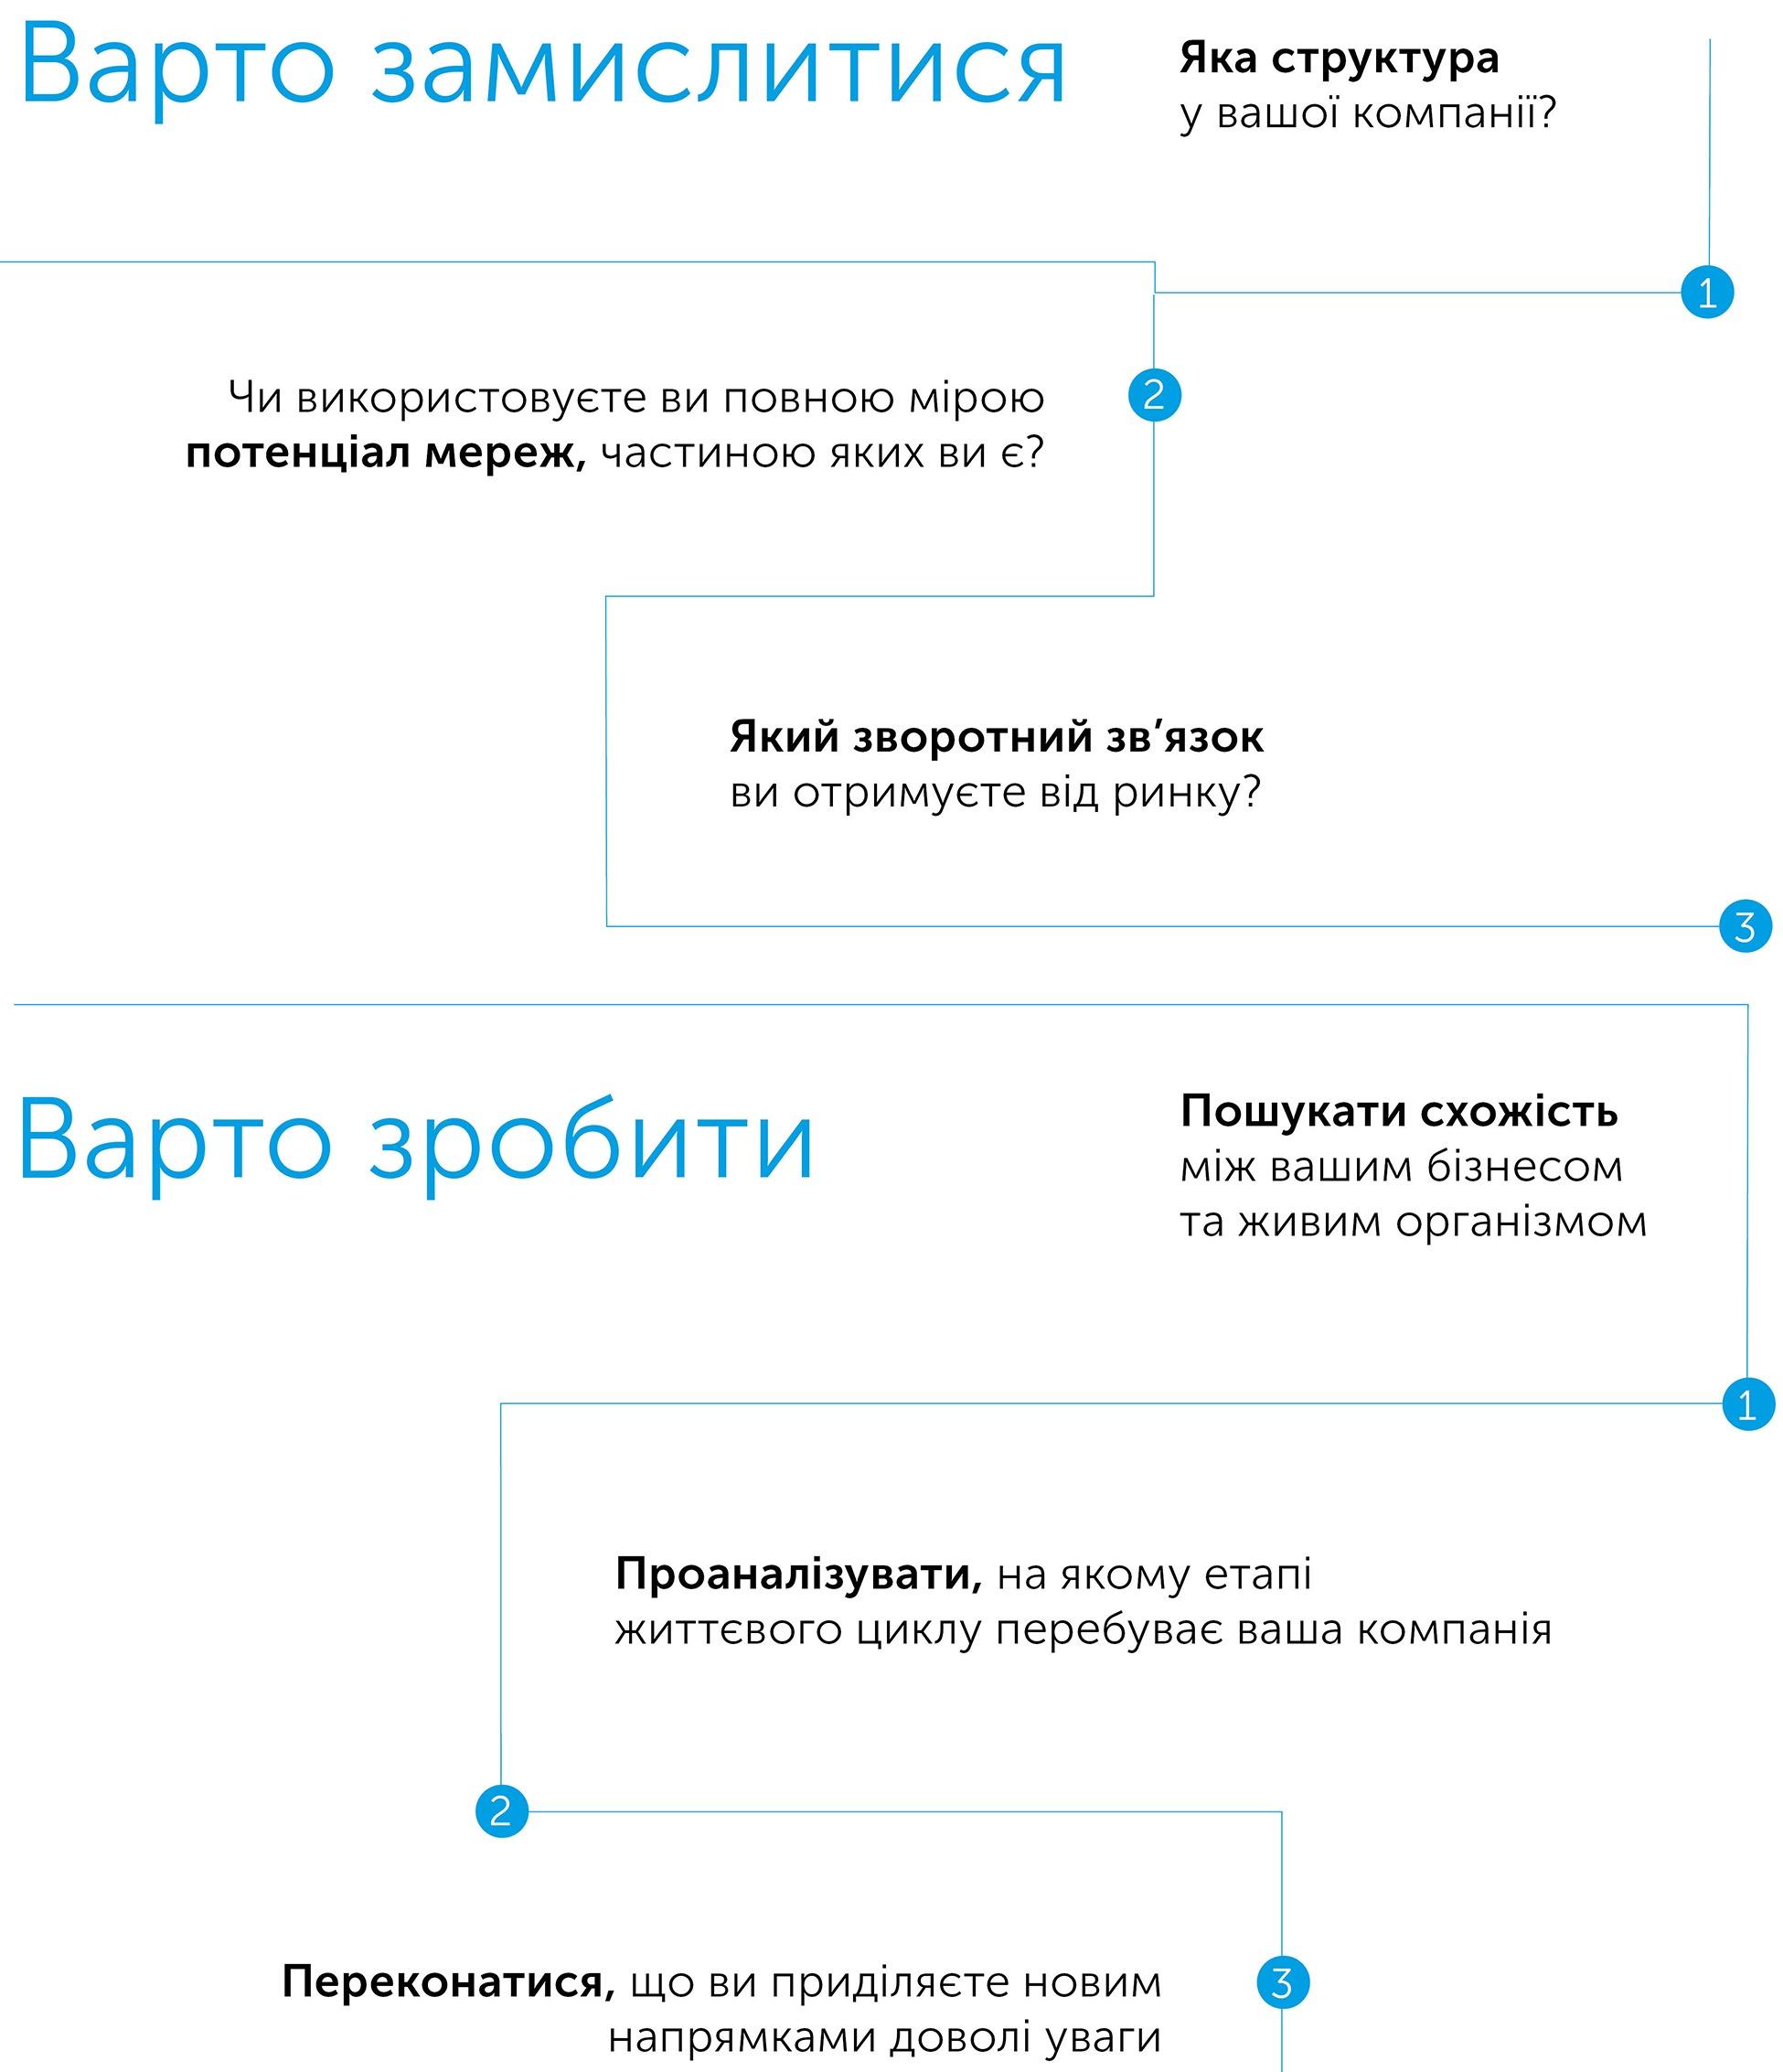 Масштаб, author Джеффрі Вест   Kyivstar Business Hub, image №4